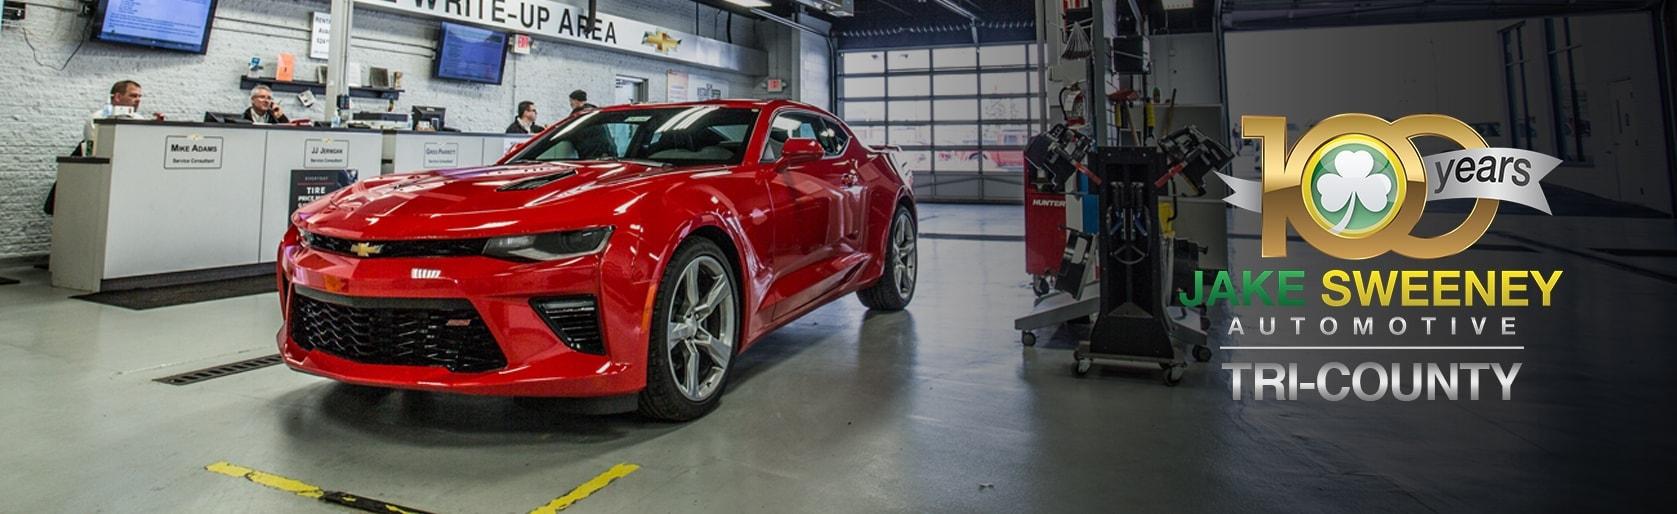 Jake Sweeney Mazda >> Jake Sweeney Automotive - New And Used Cars, Trucks, And ...